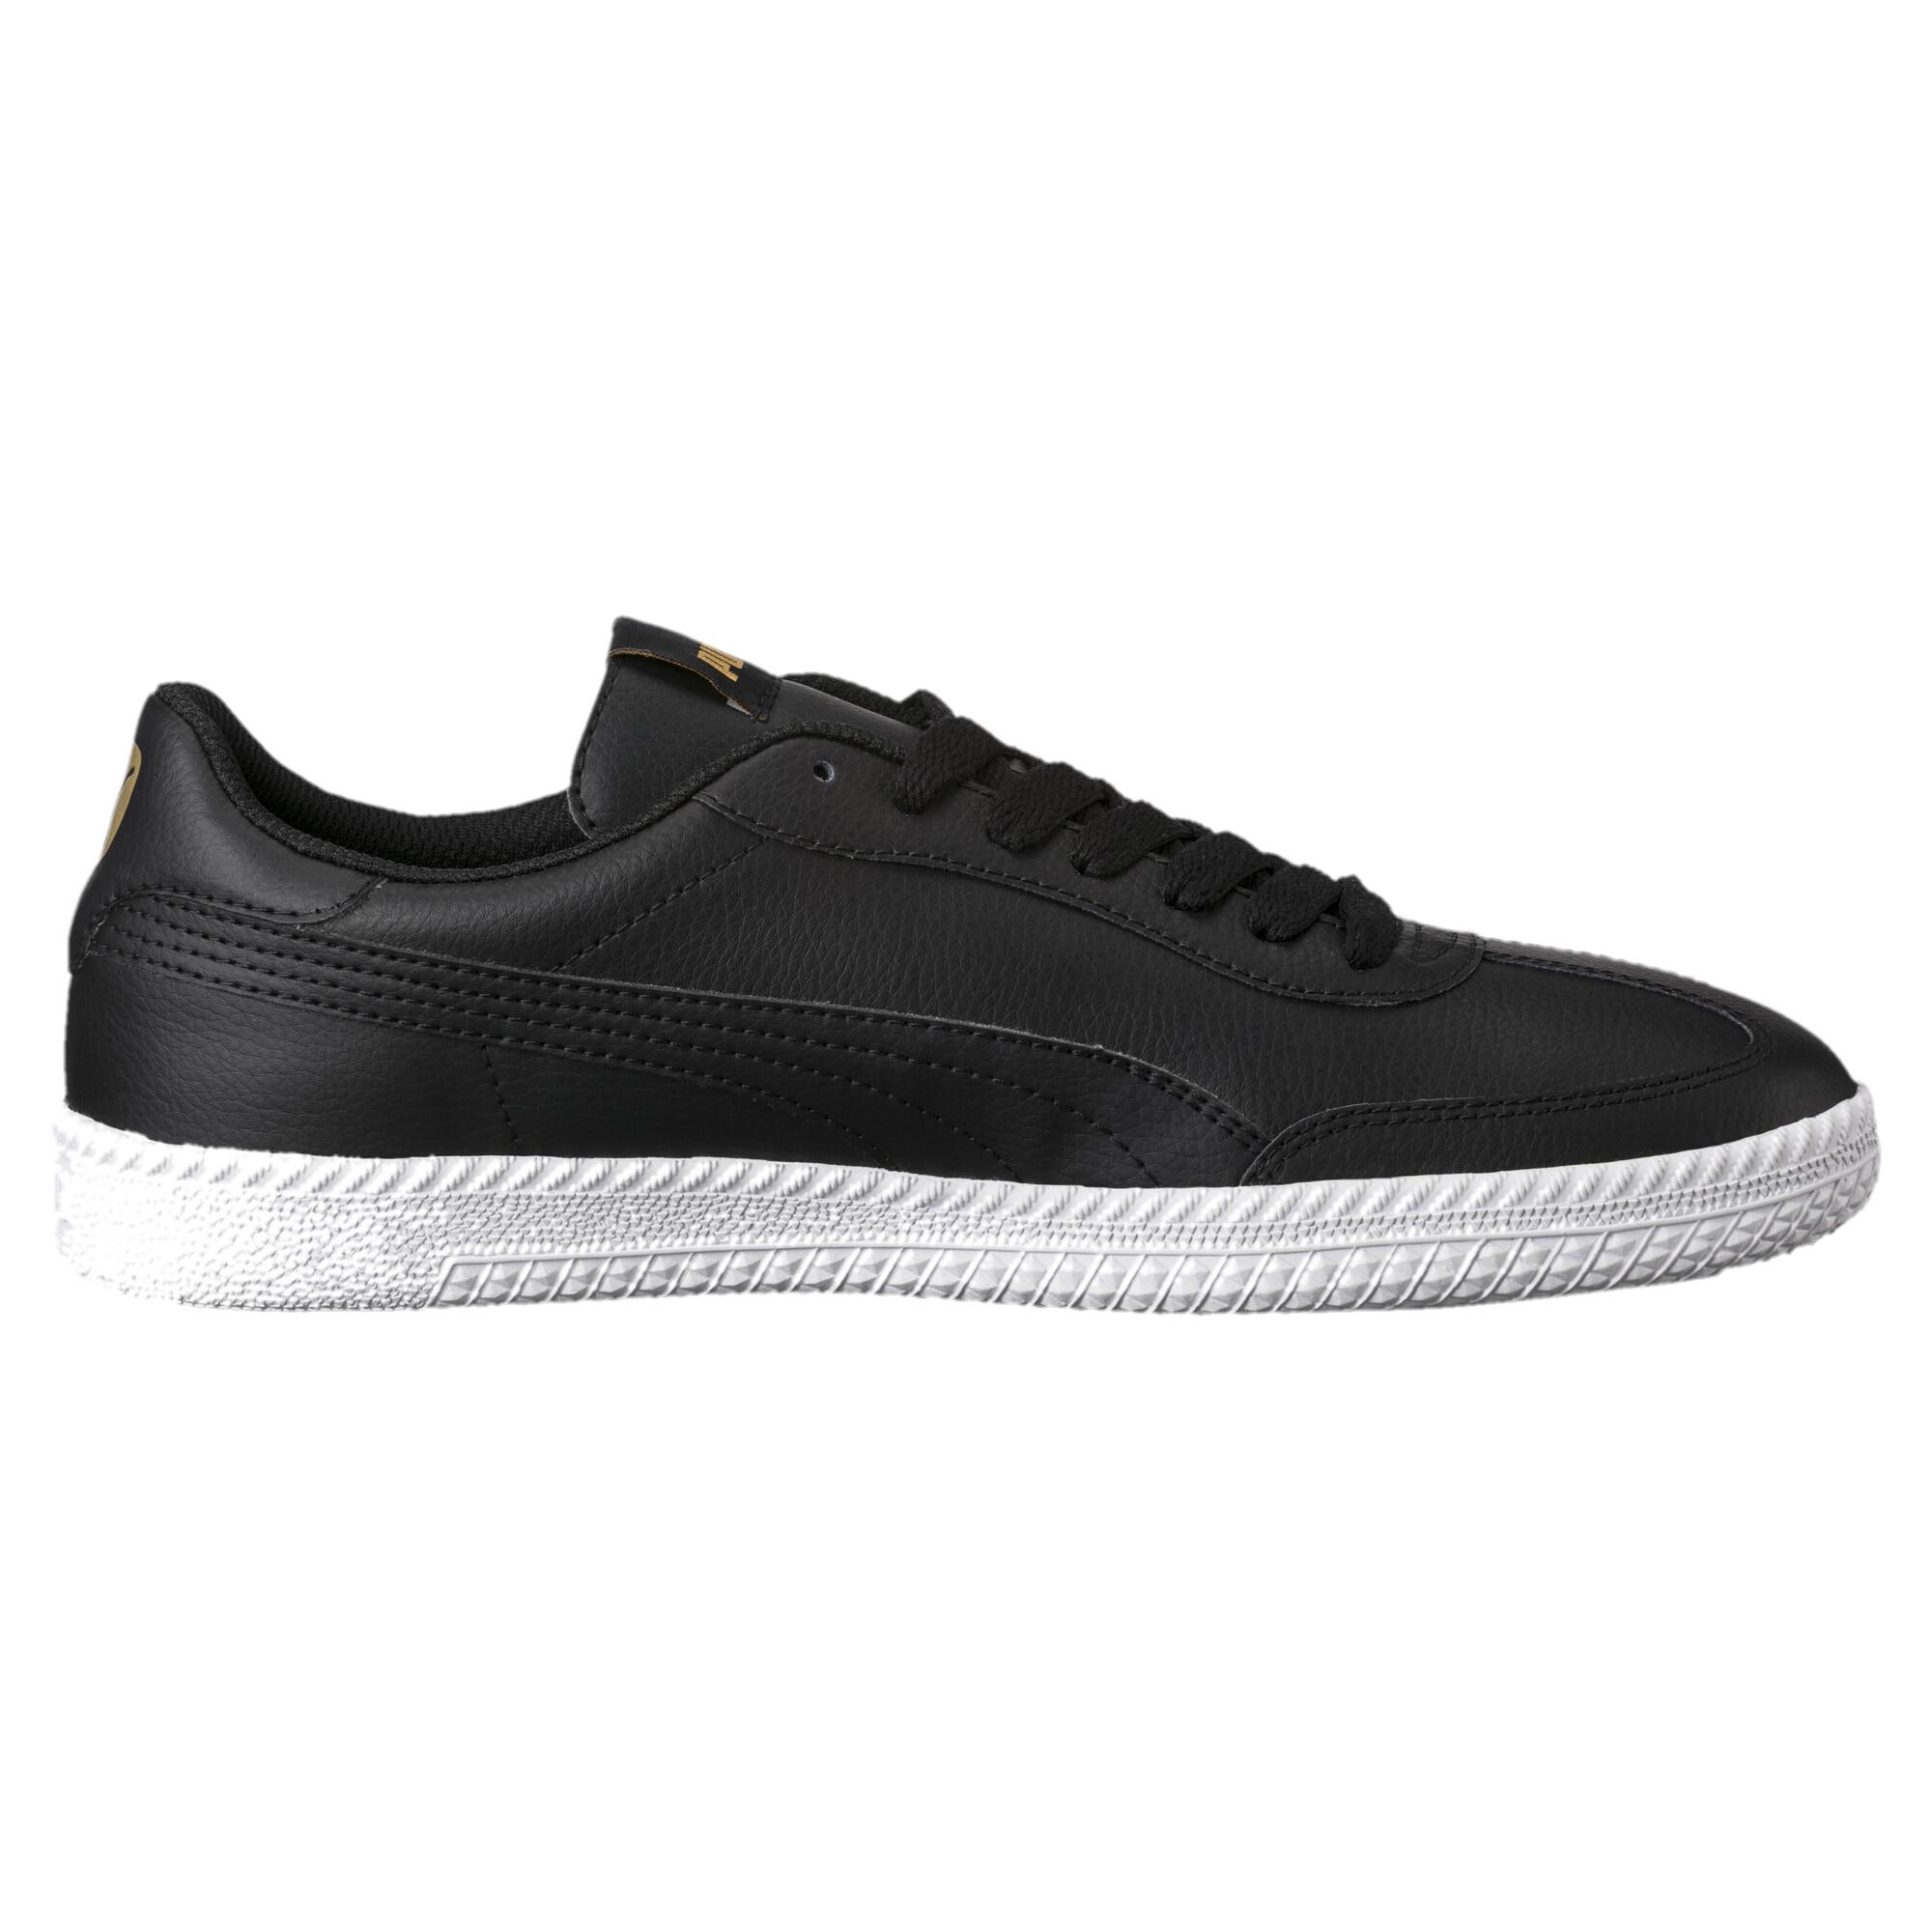 PUMA-Astro-Cup-Leather-Trainers-Men-Shoe-Basics thumbnail 10